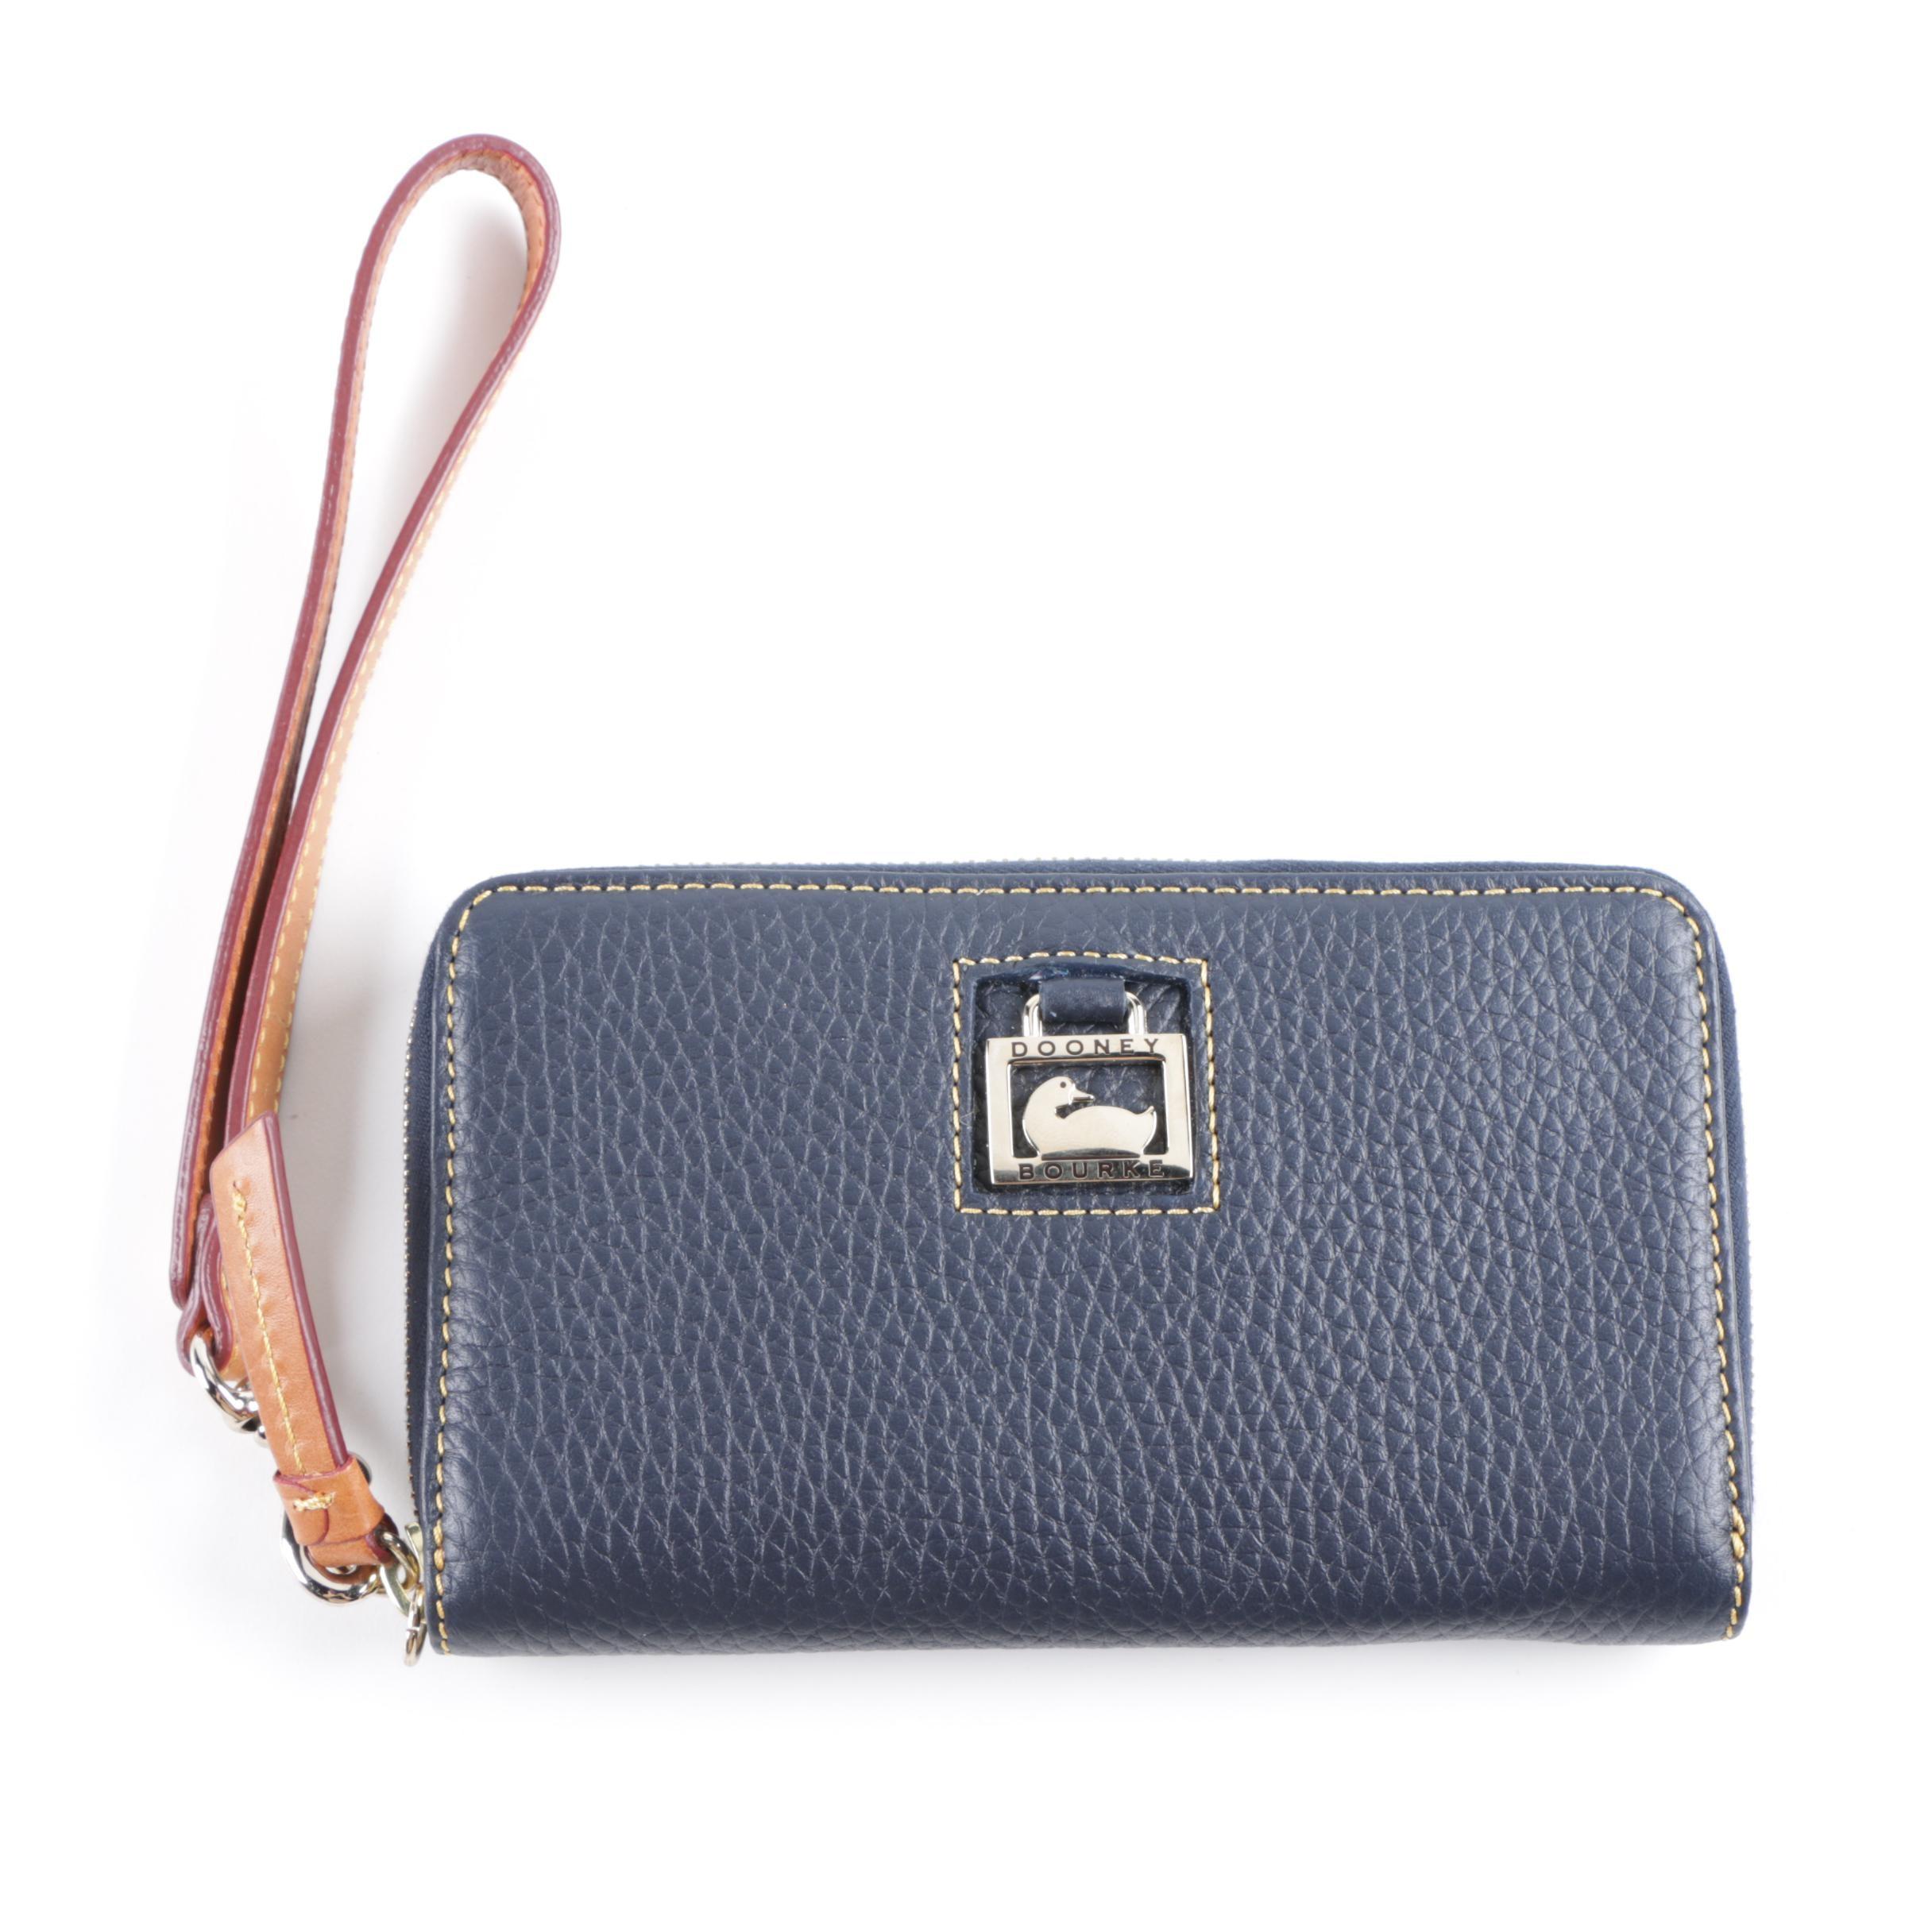 Dooney & Bourke Navy Leather Wristlet Wallet